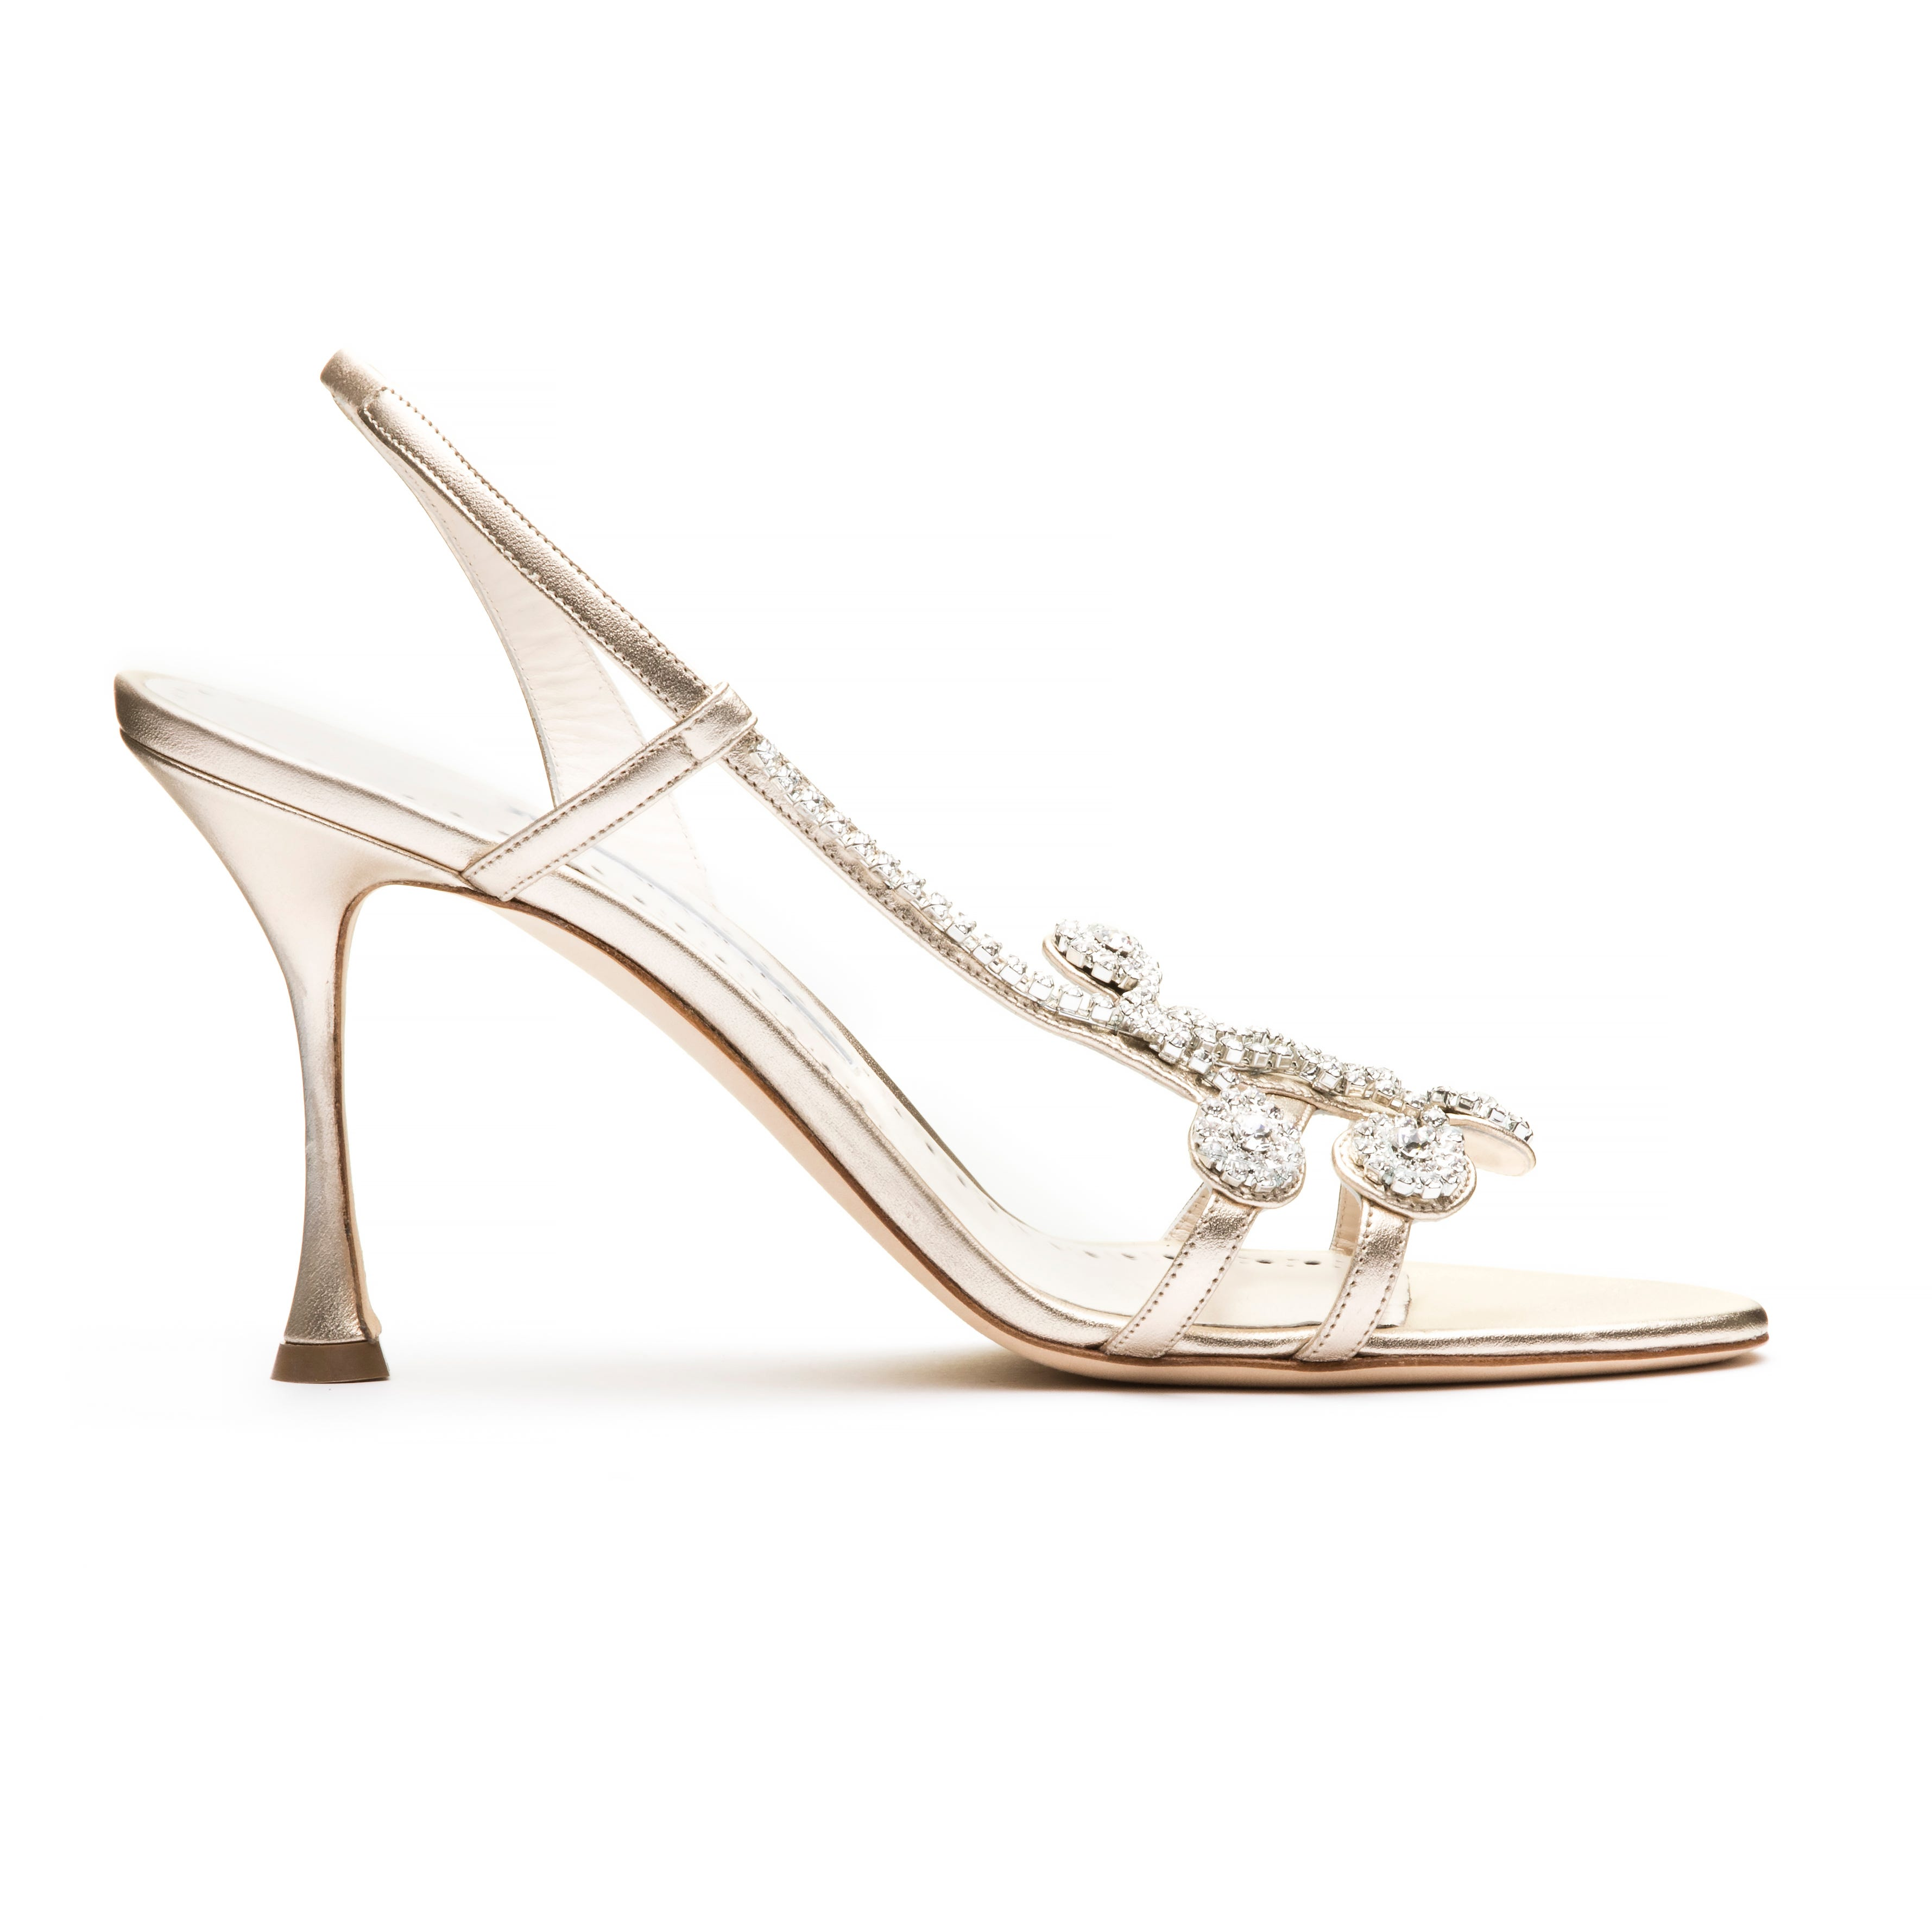 Manolo Blahnik Wedding Shoes Choice Image Wedding Dress